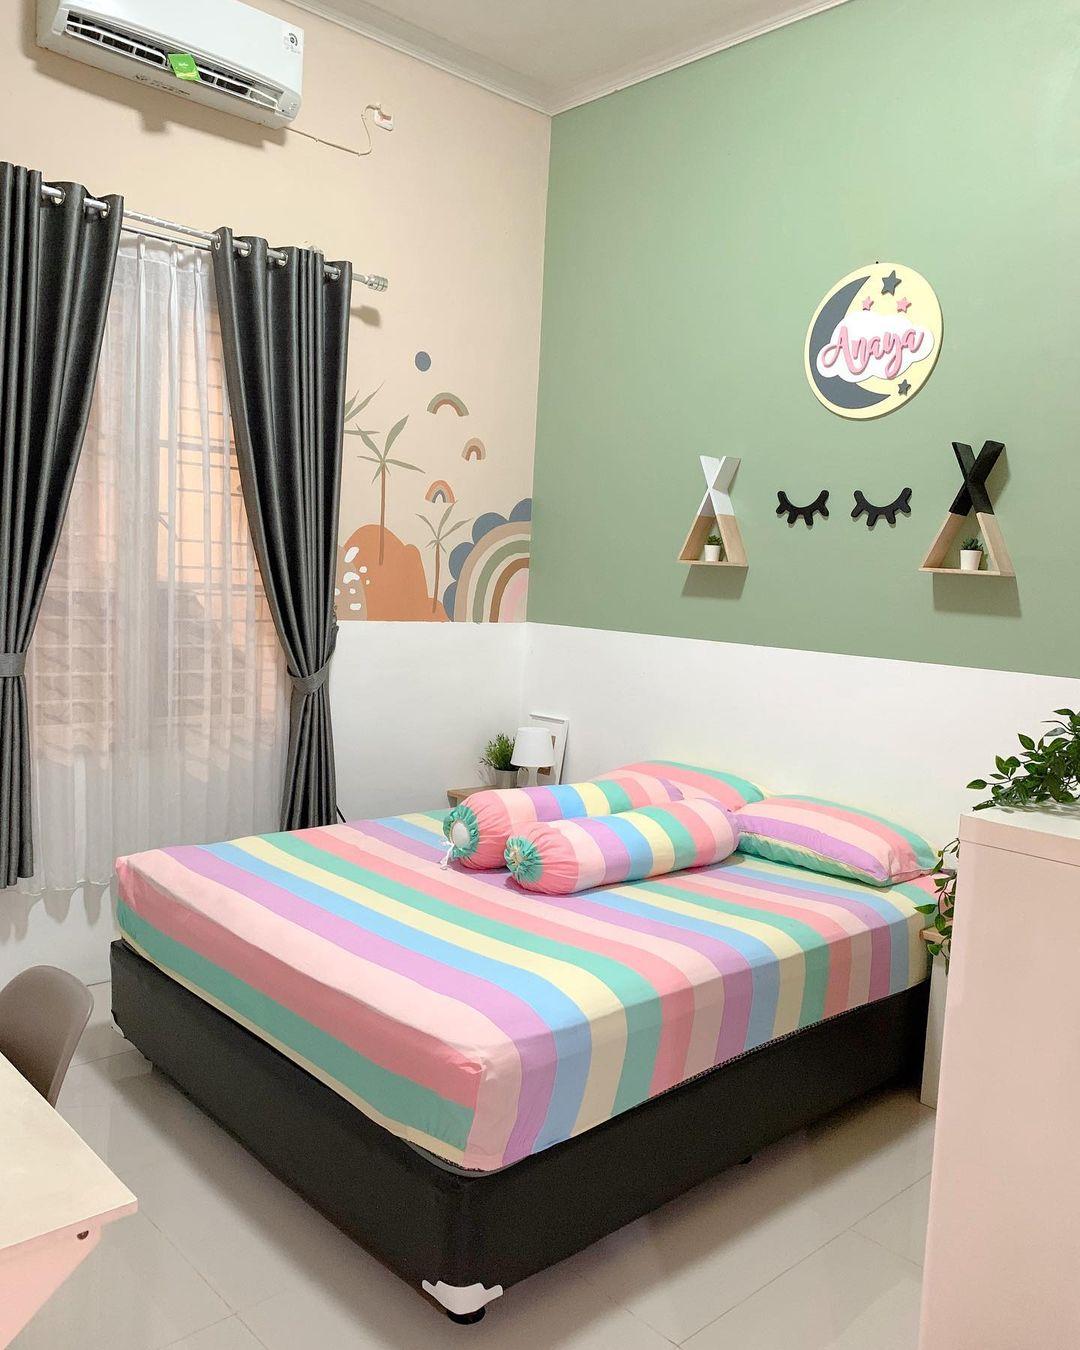 Desain kamar tidur minimalis_3